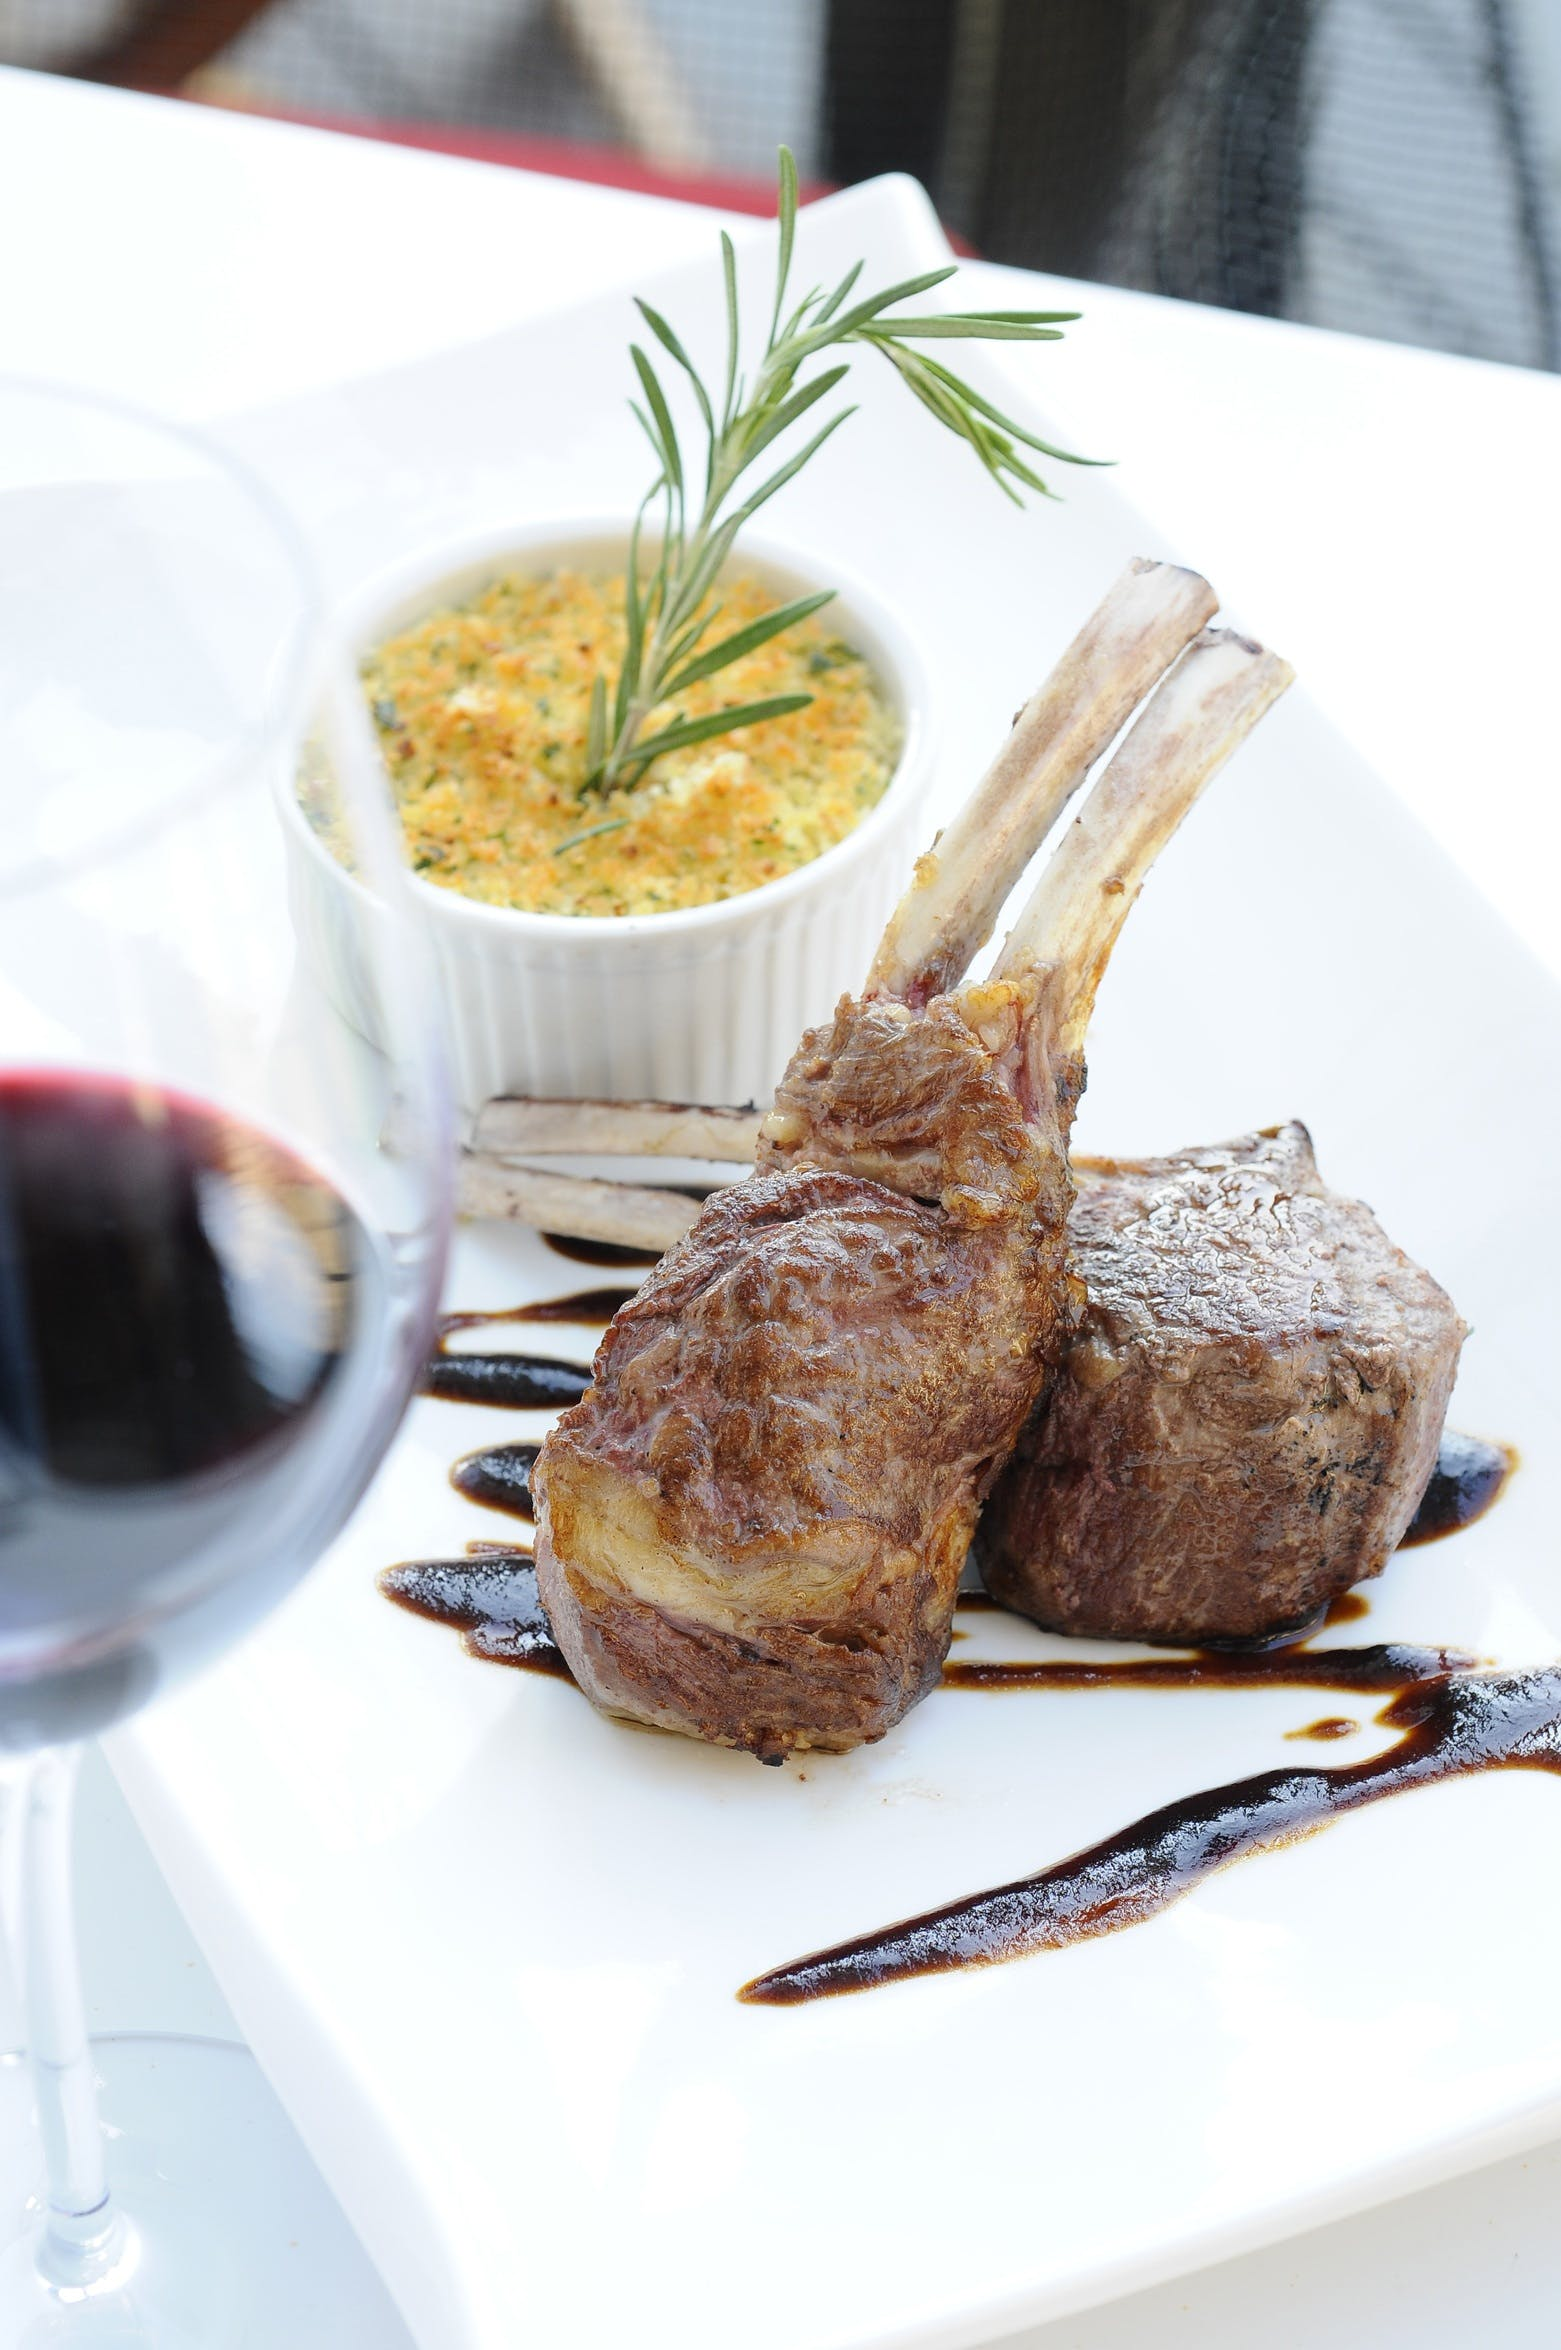 Free stock photo of food, italy, rack of lamb